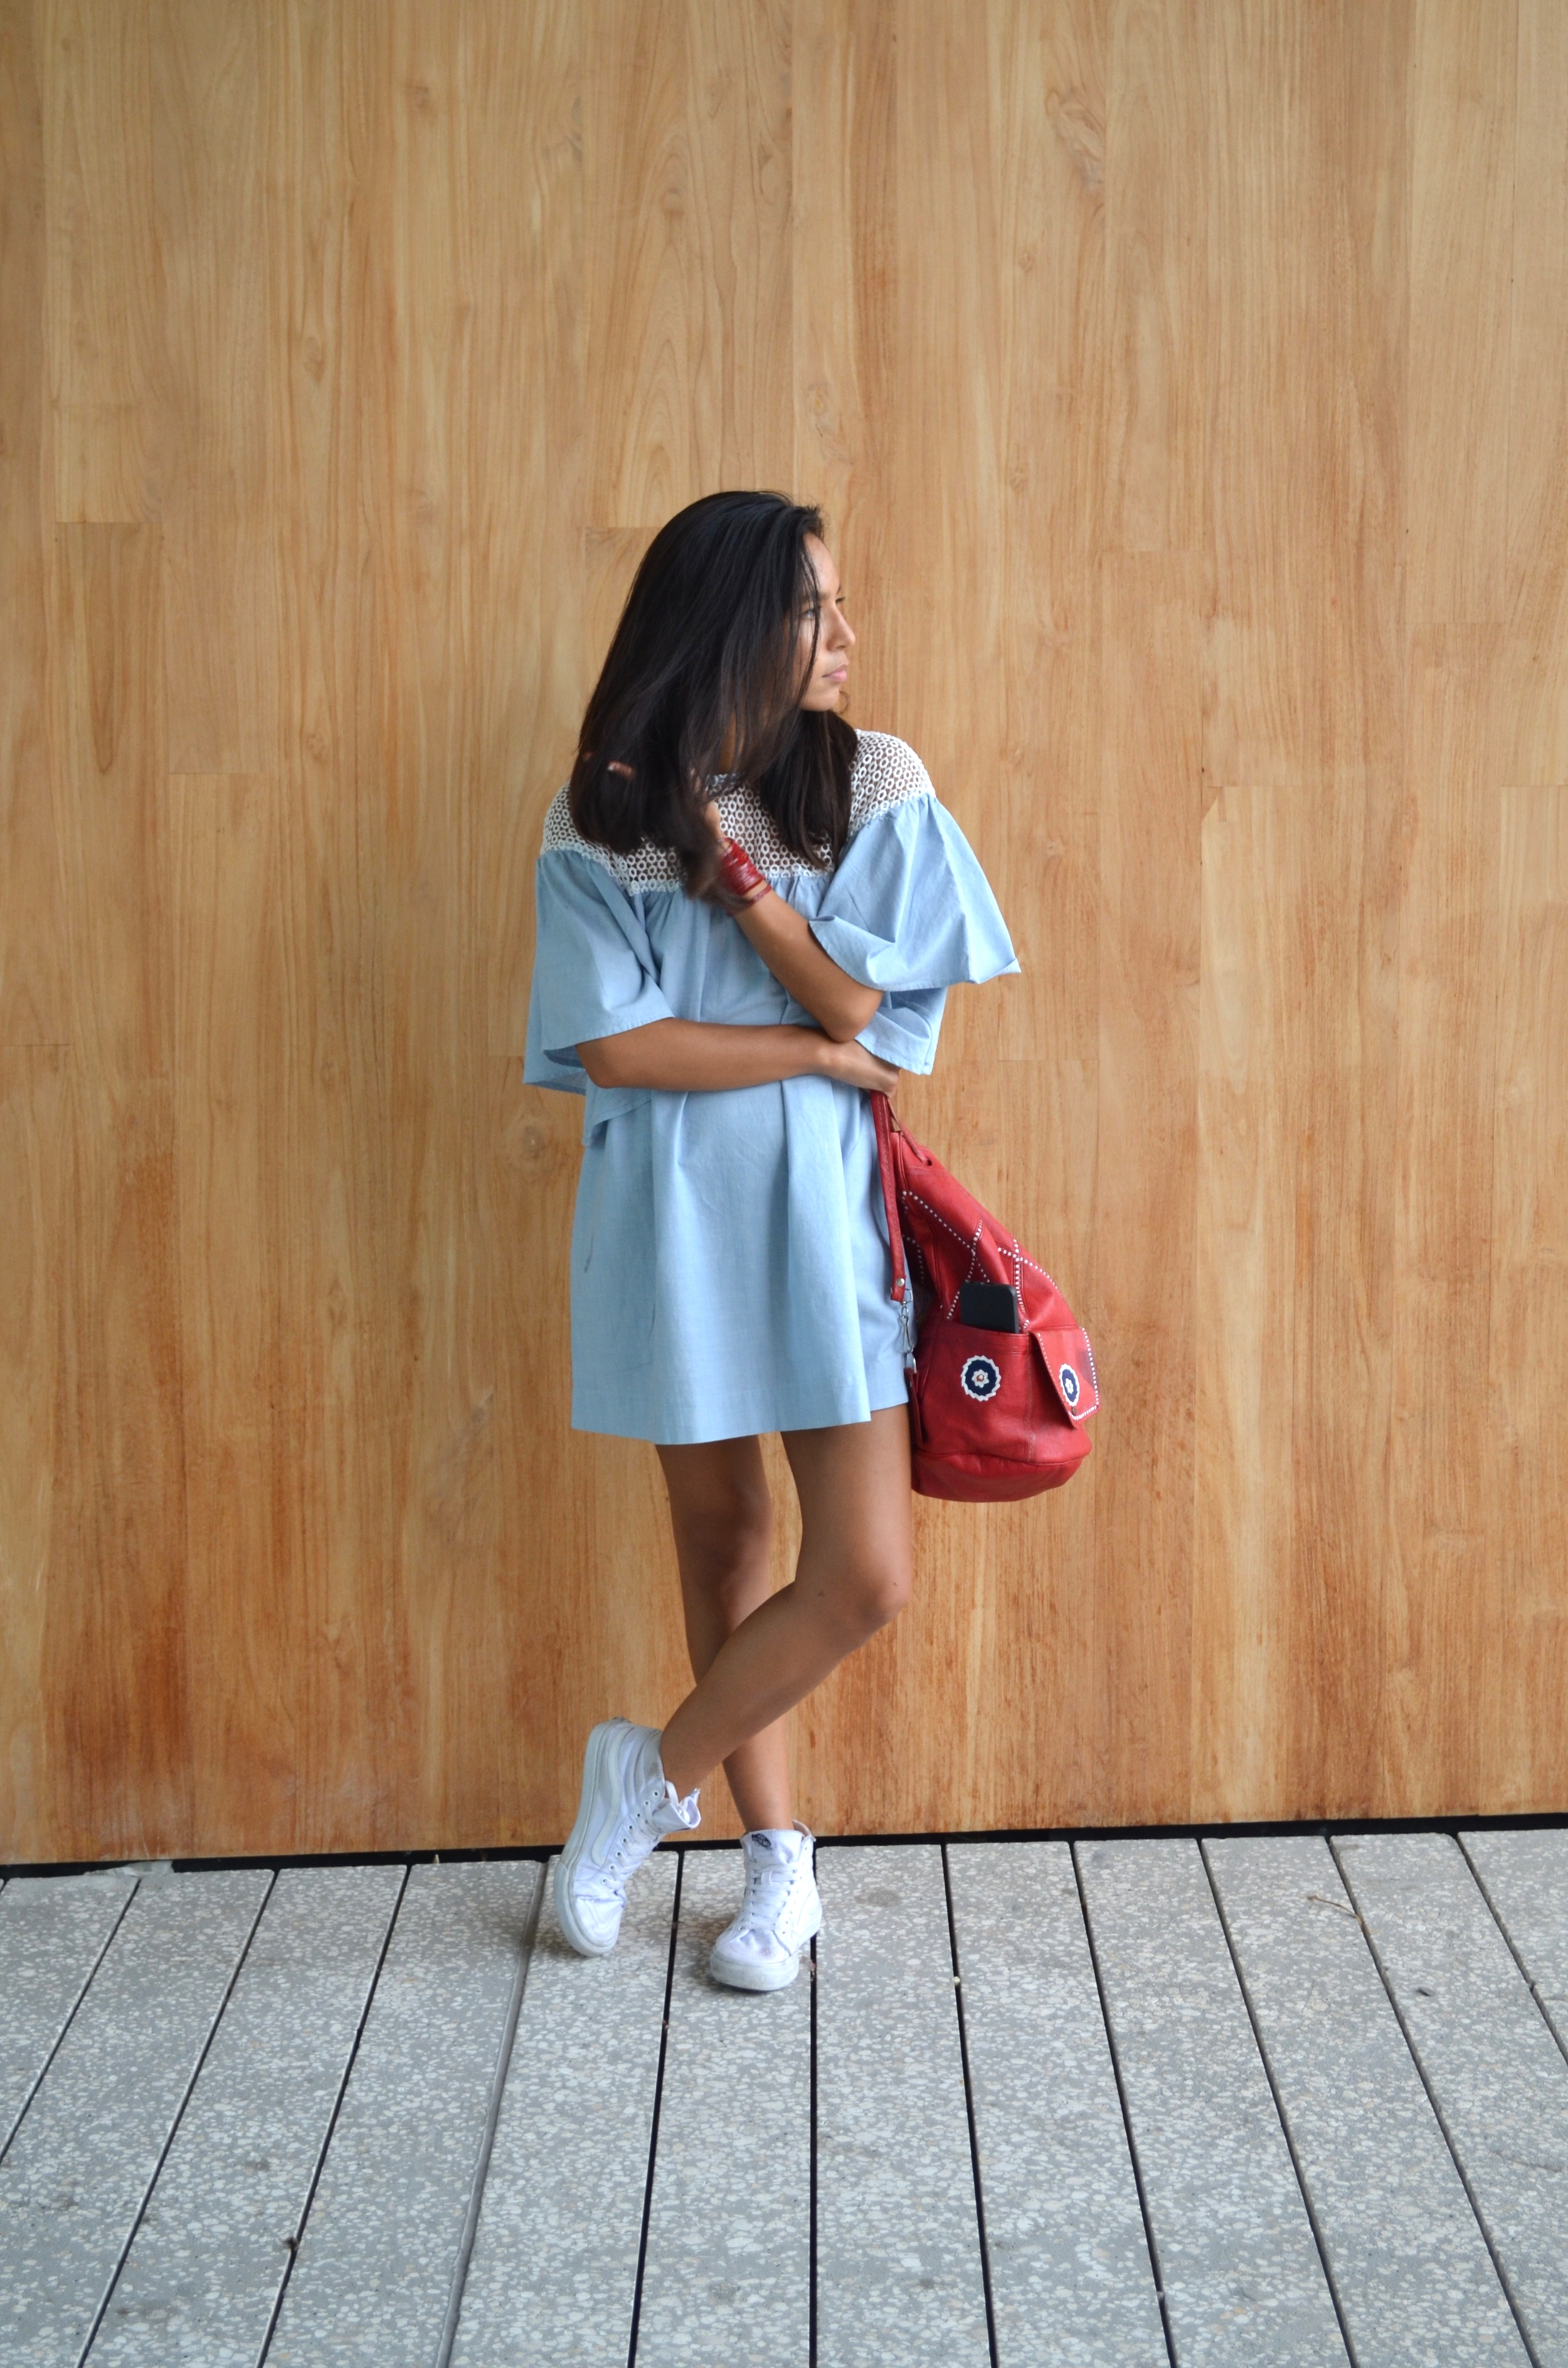 Cooperative Carnaby StreetLace-Shoulder Dress , Urban Outfitters ; Bar Stud Set,  Forever 21 ; Vans Sk8-Hi Tonal Slim Sneaker , Urban Outfitters